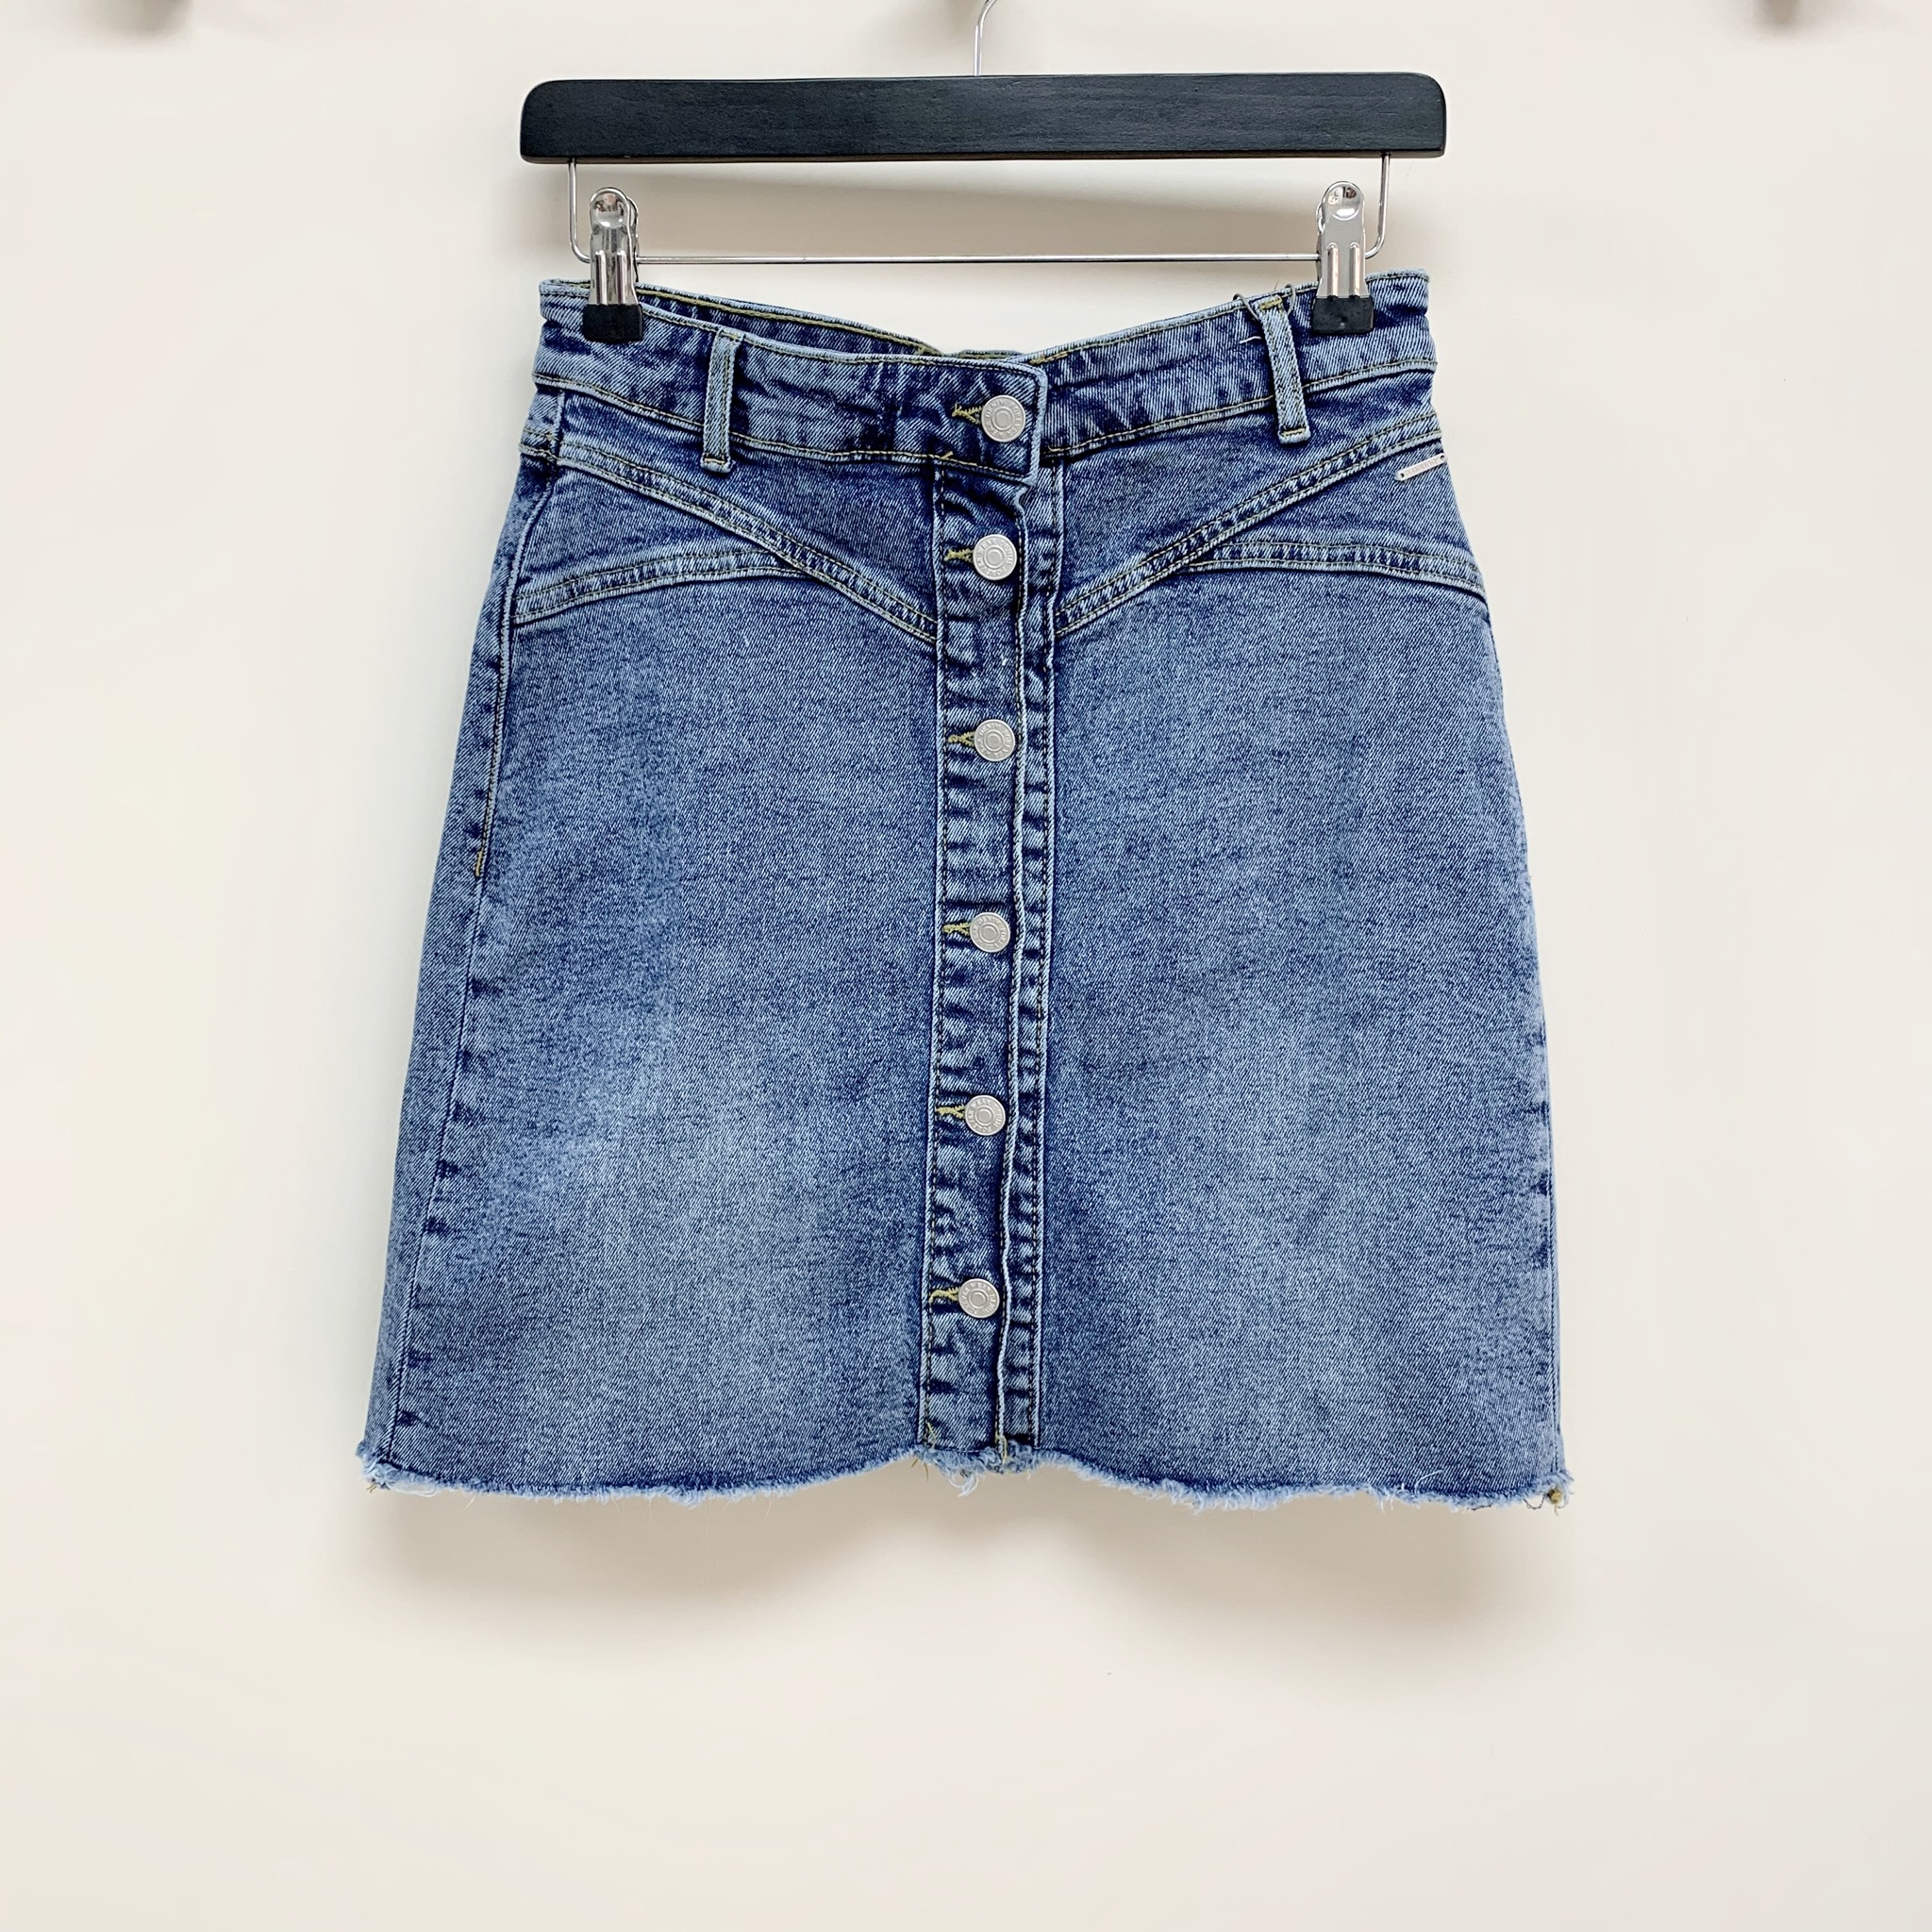 SALE Killi Denim Skirt